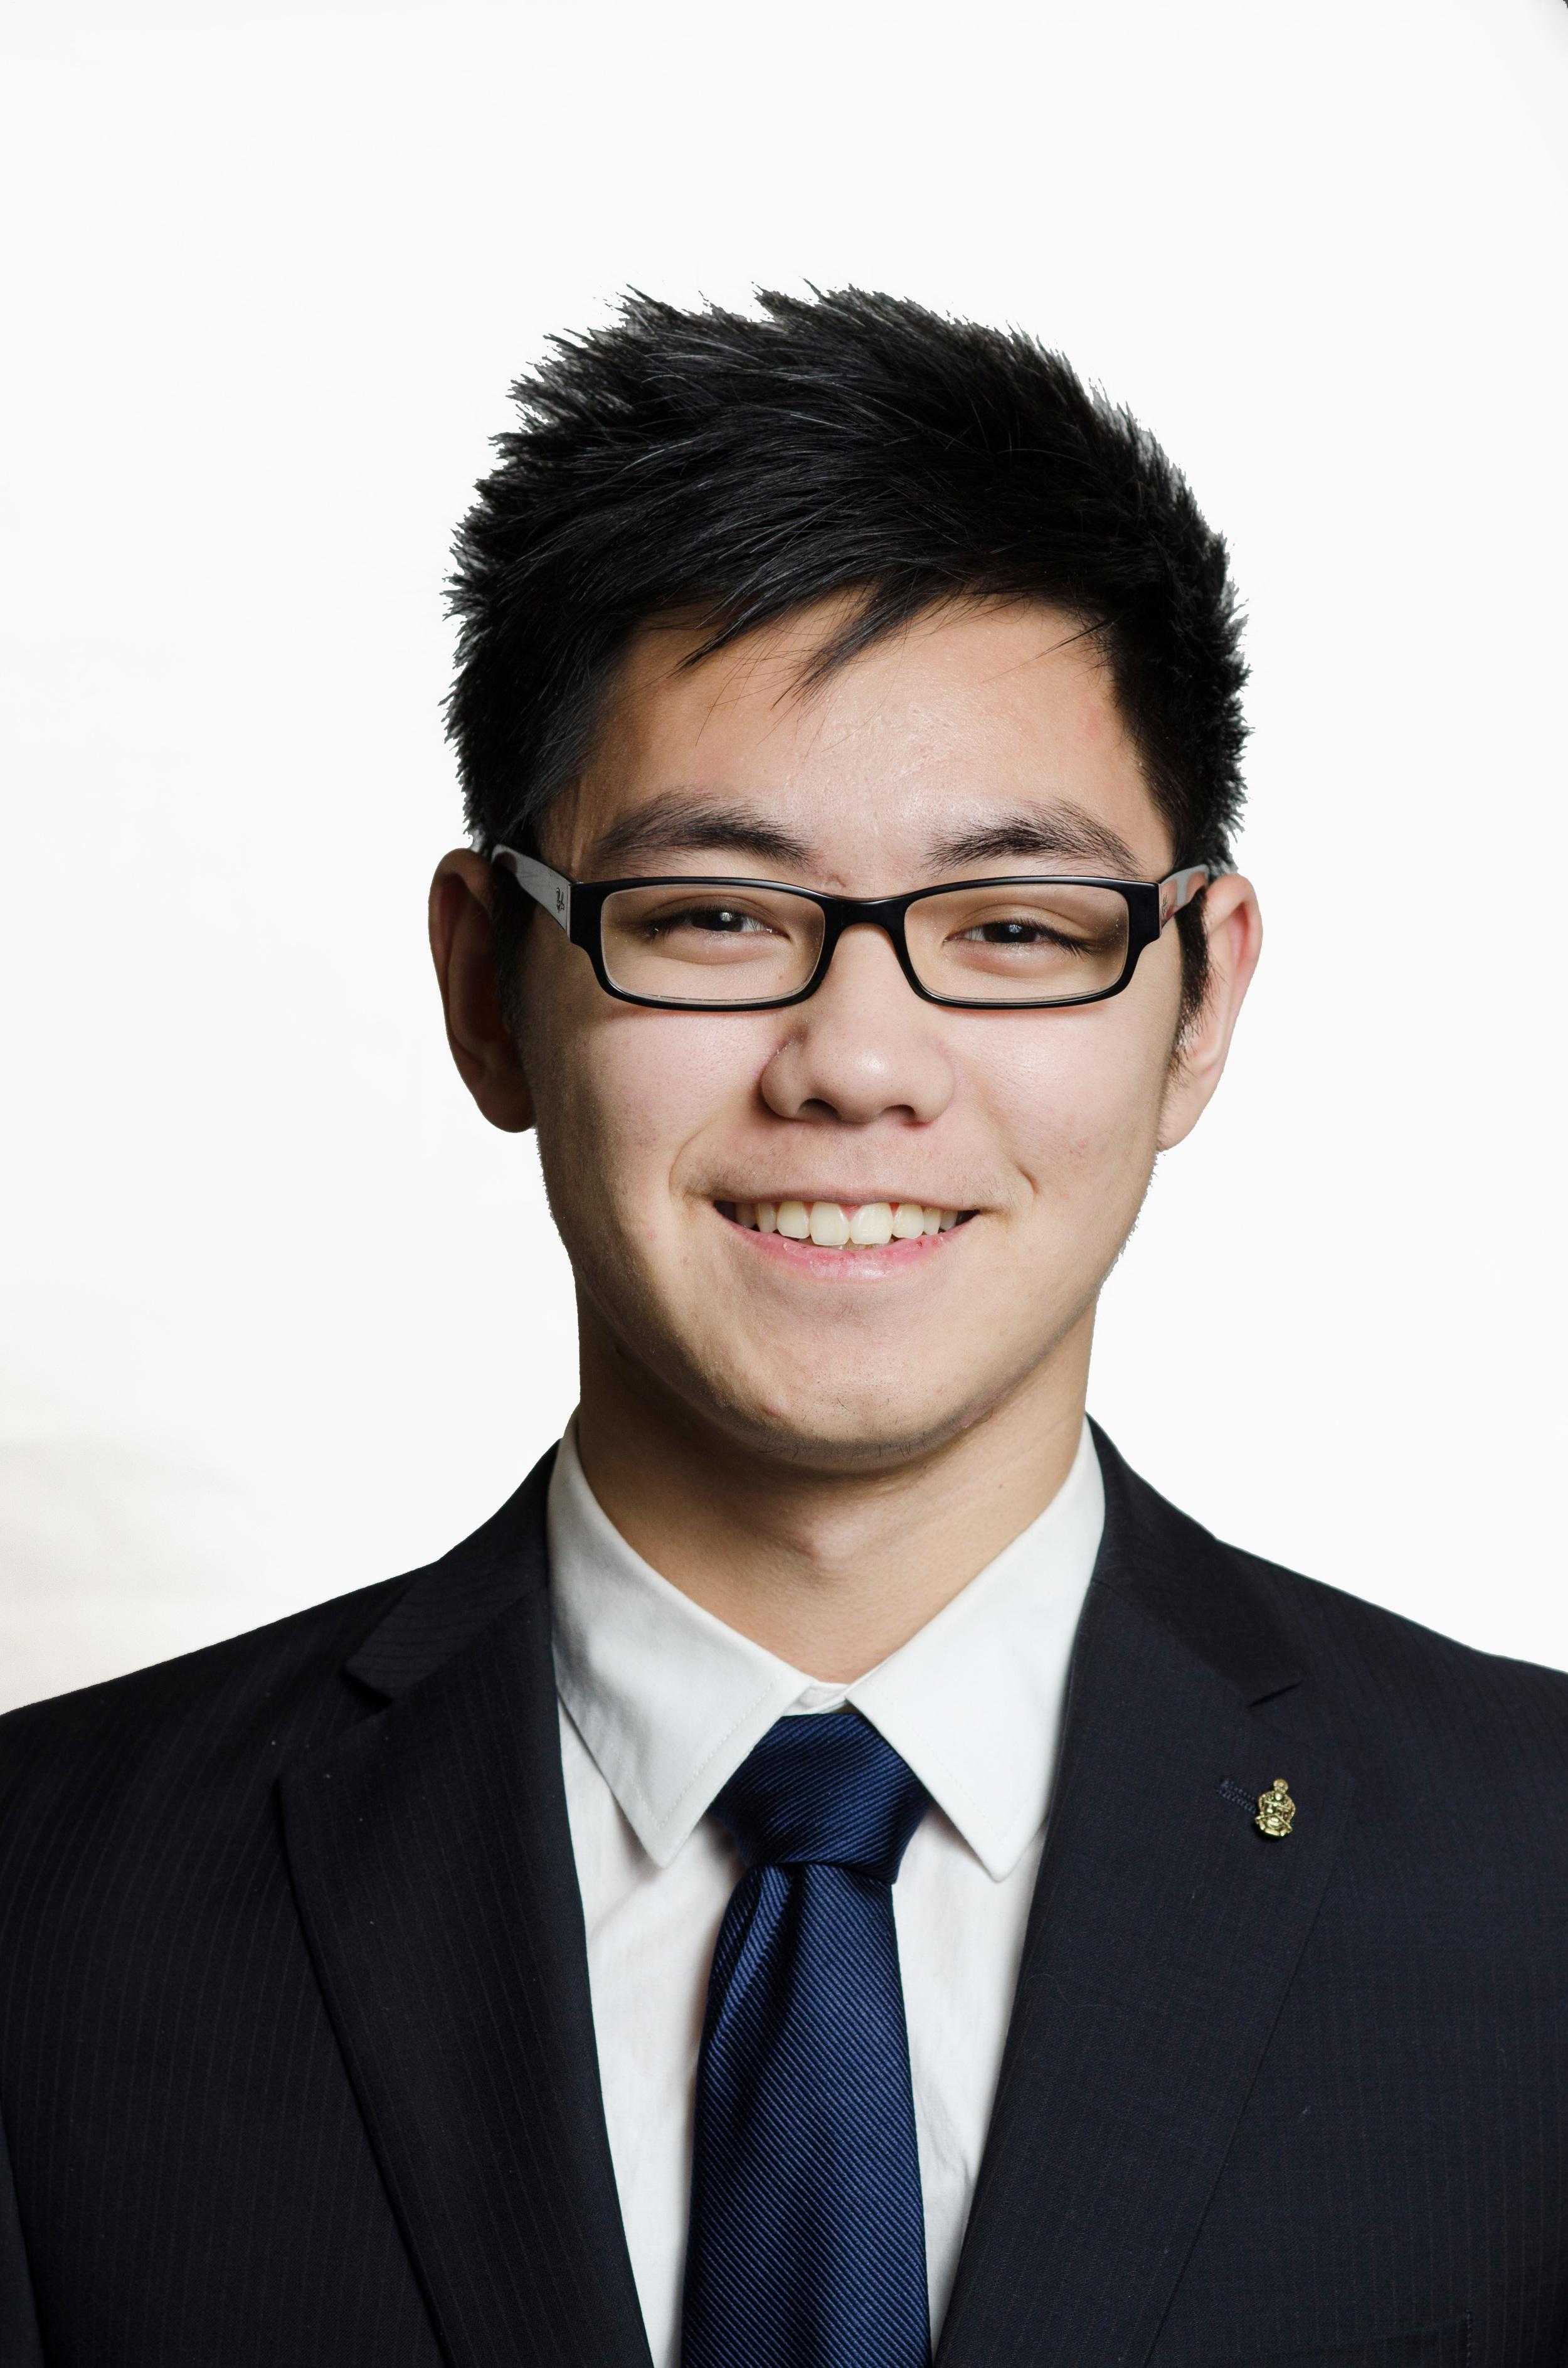 Andrew Hoang